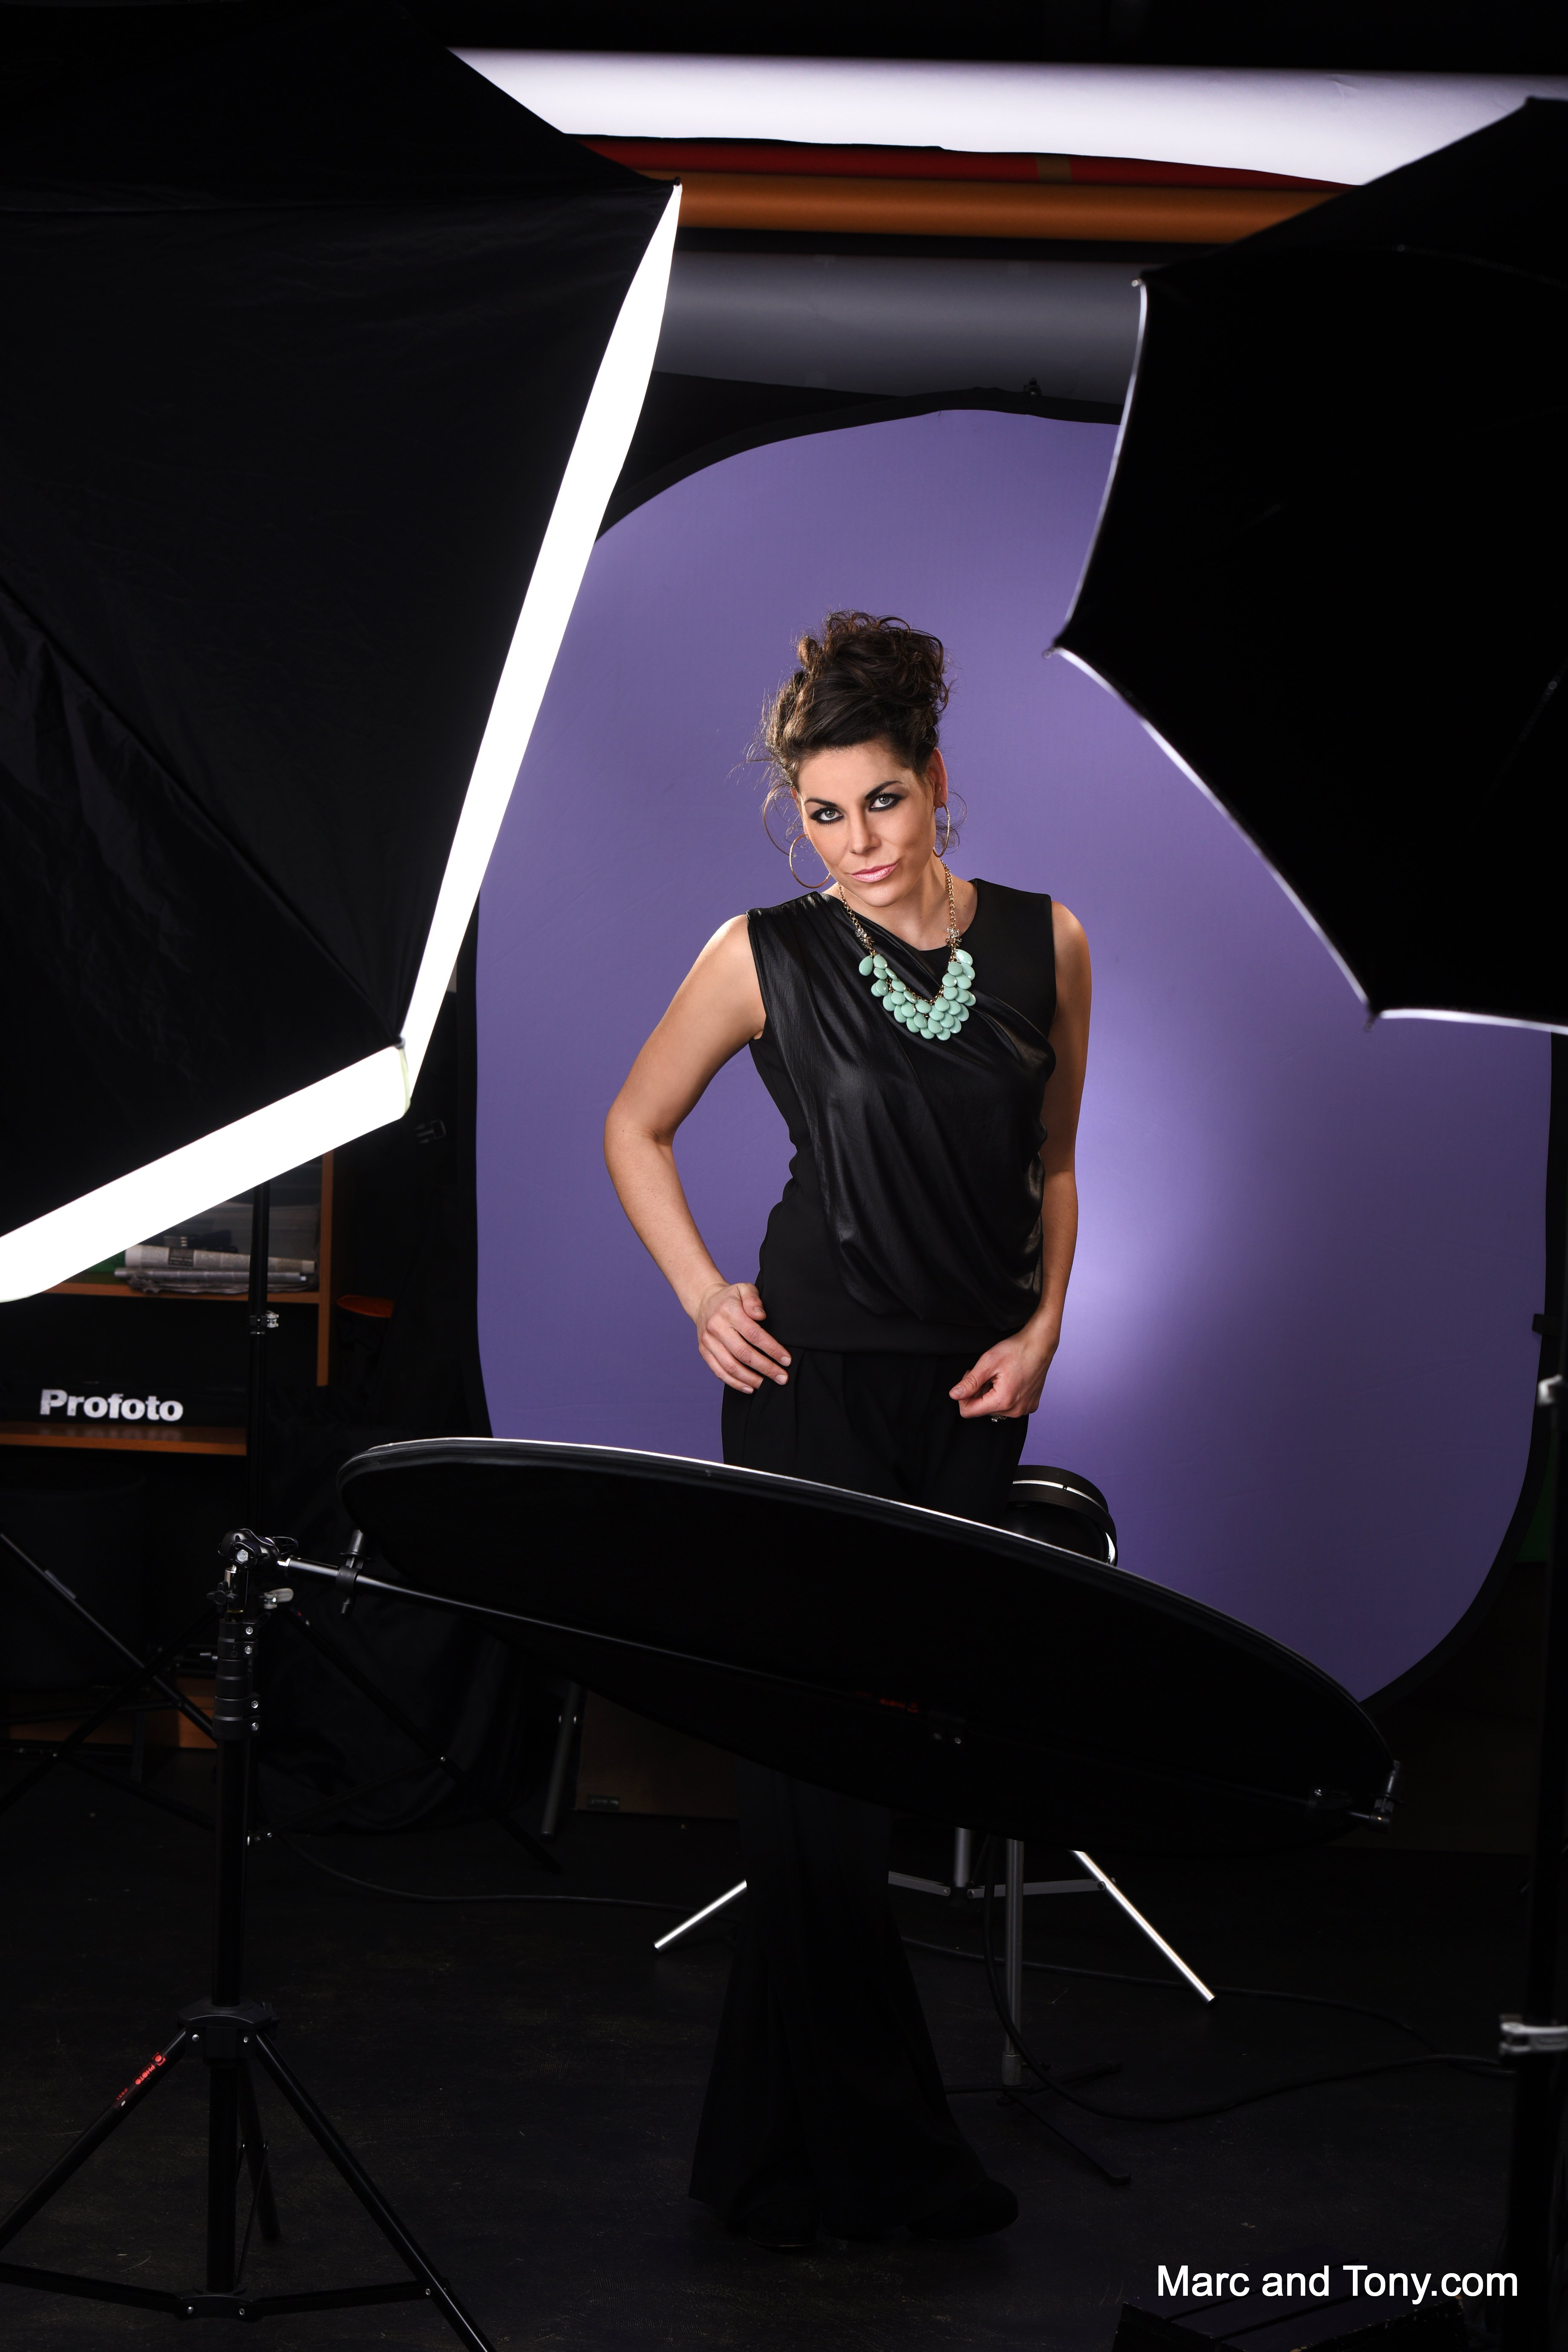 Savage Folding Light Purple/White Collapsible 1.52m x 1.83m Backdrop